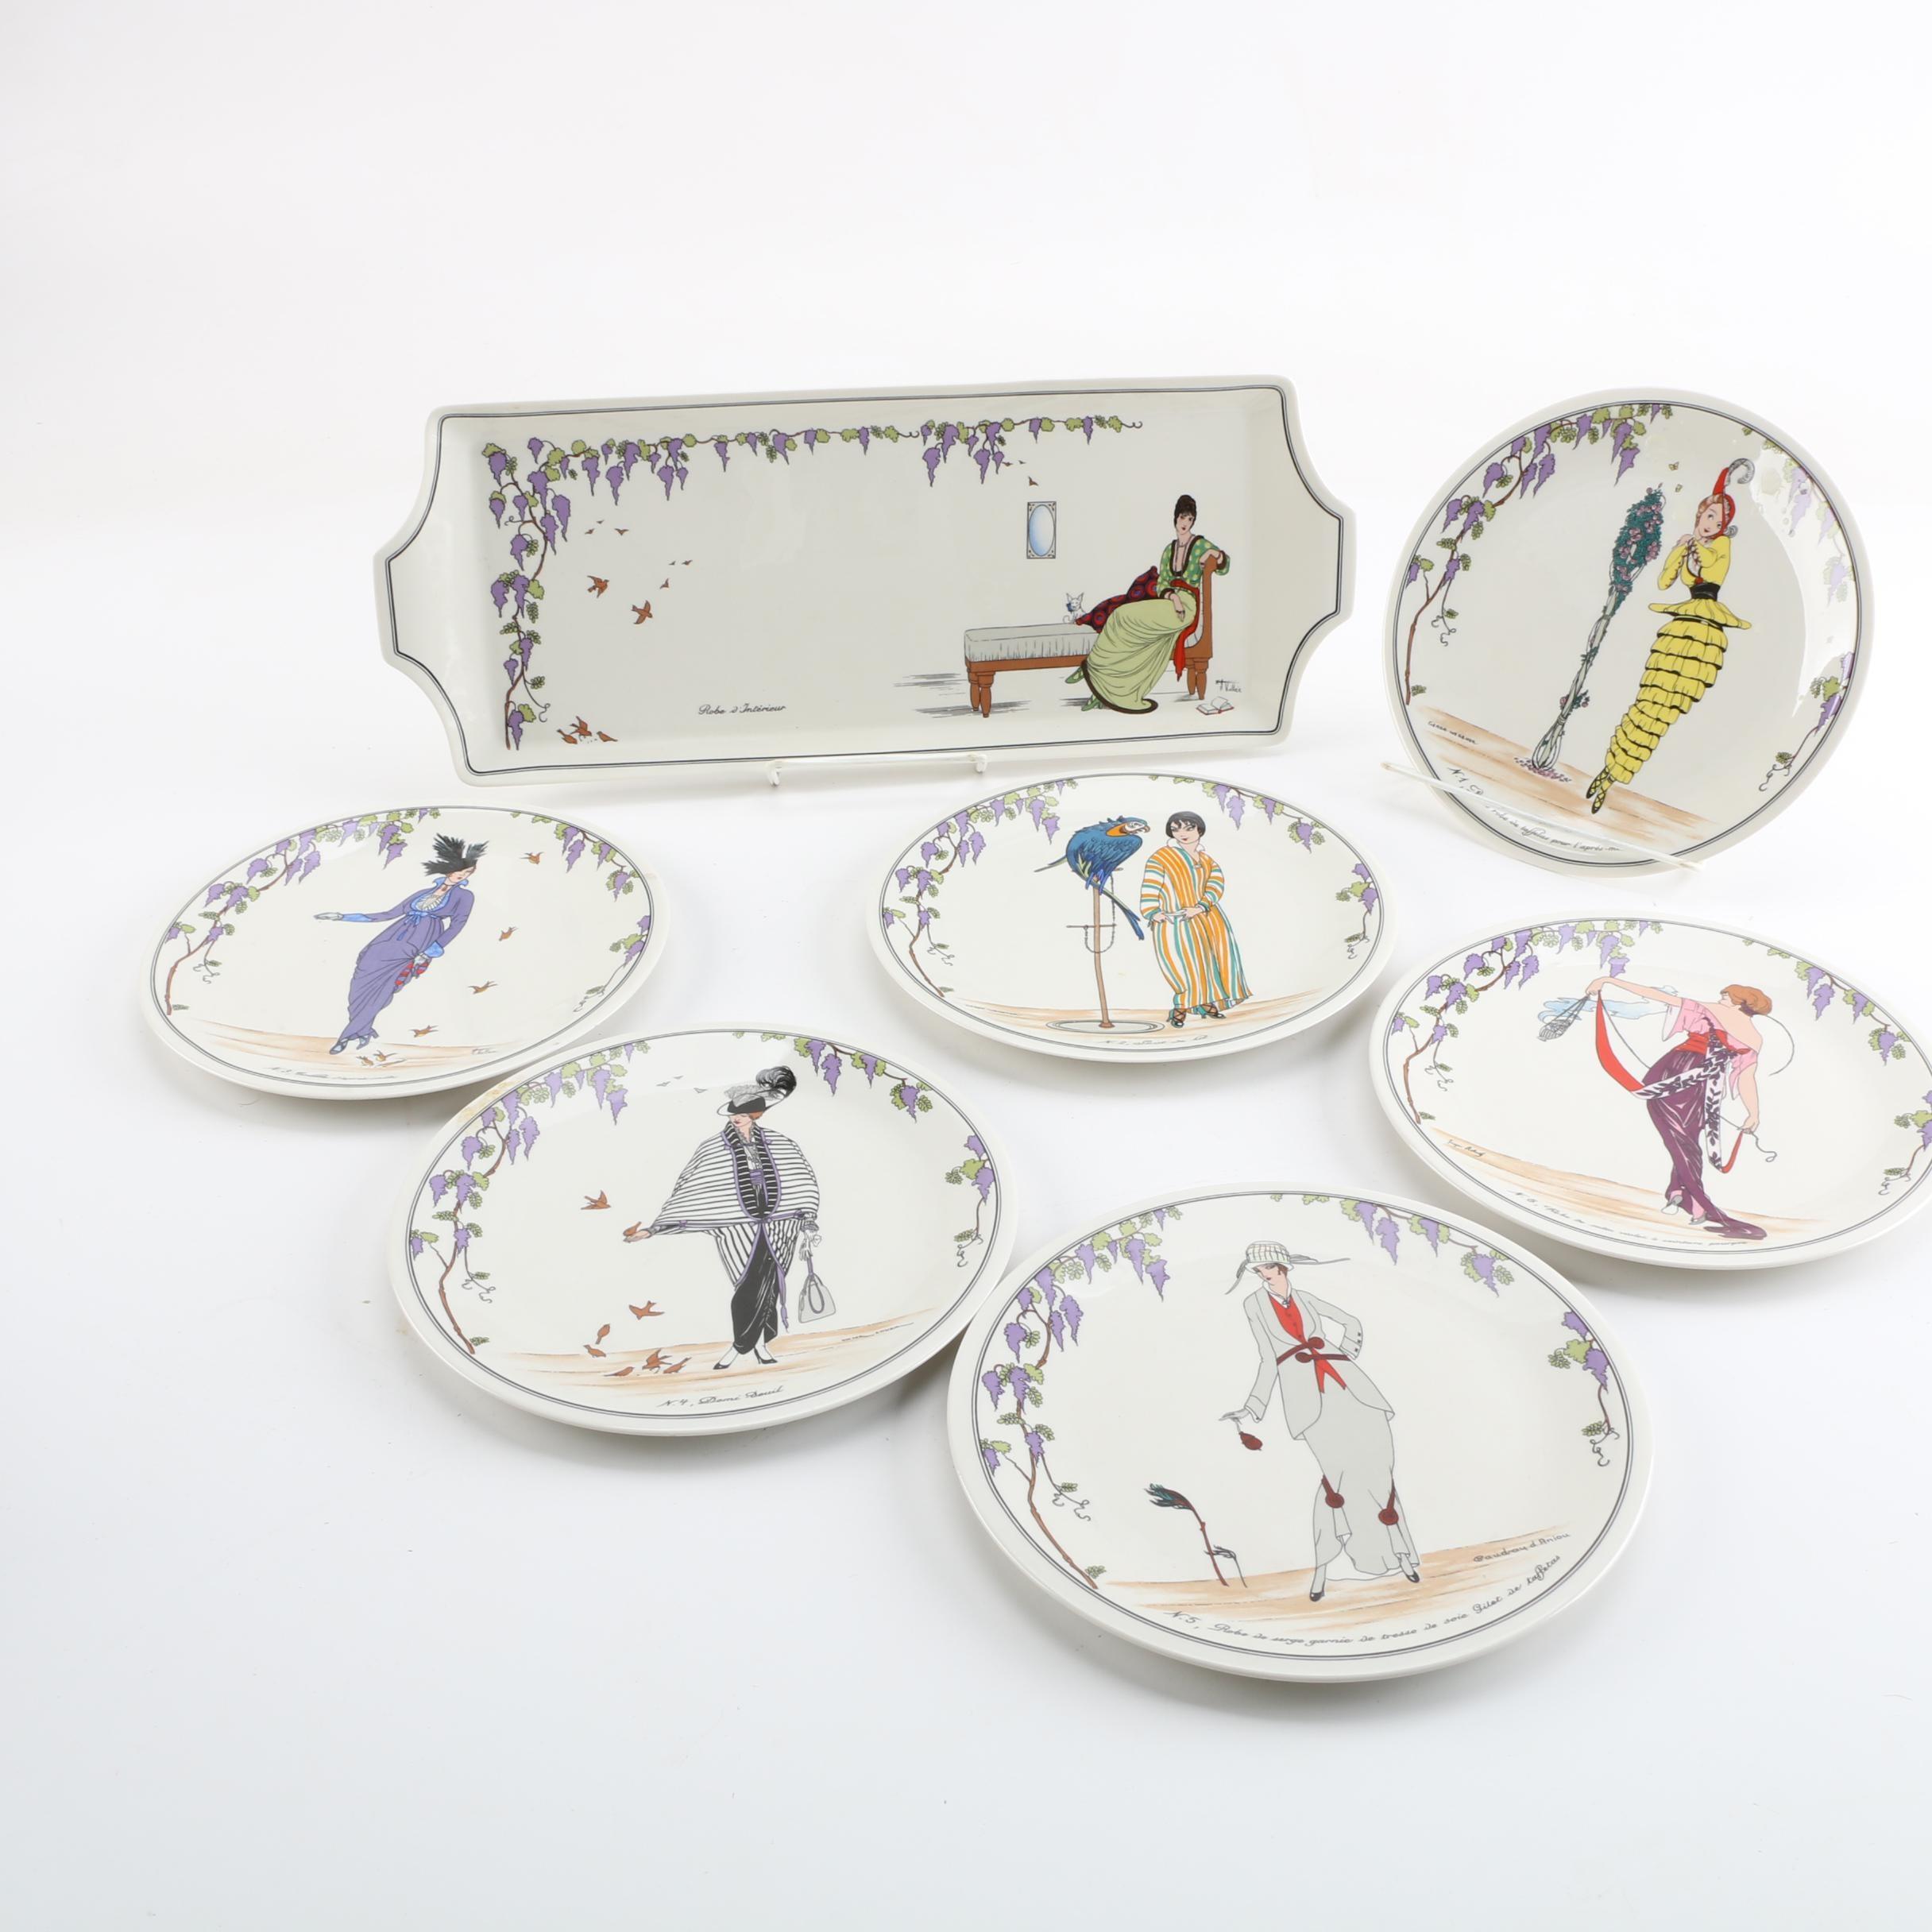 Villeroy Boch Design 1900 Dinner Plates And Sandwich Tray Ebth